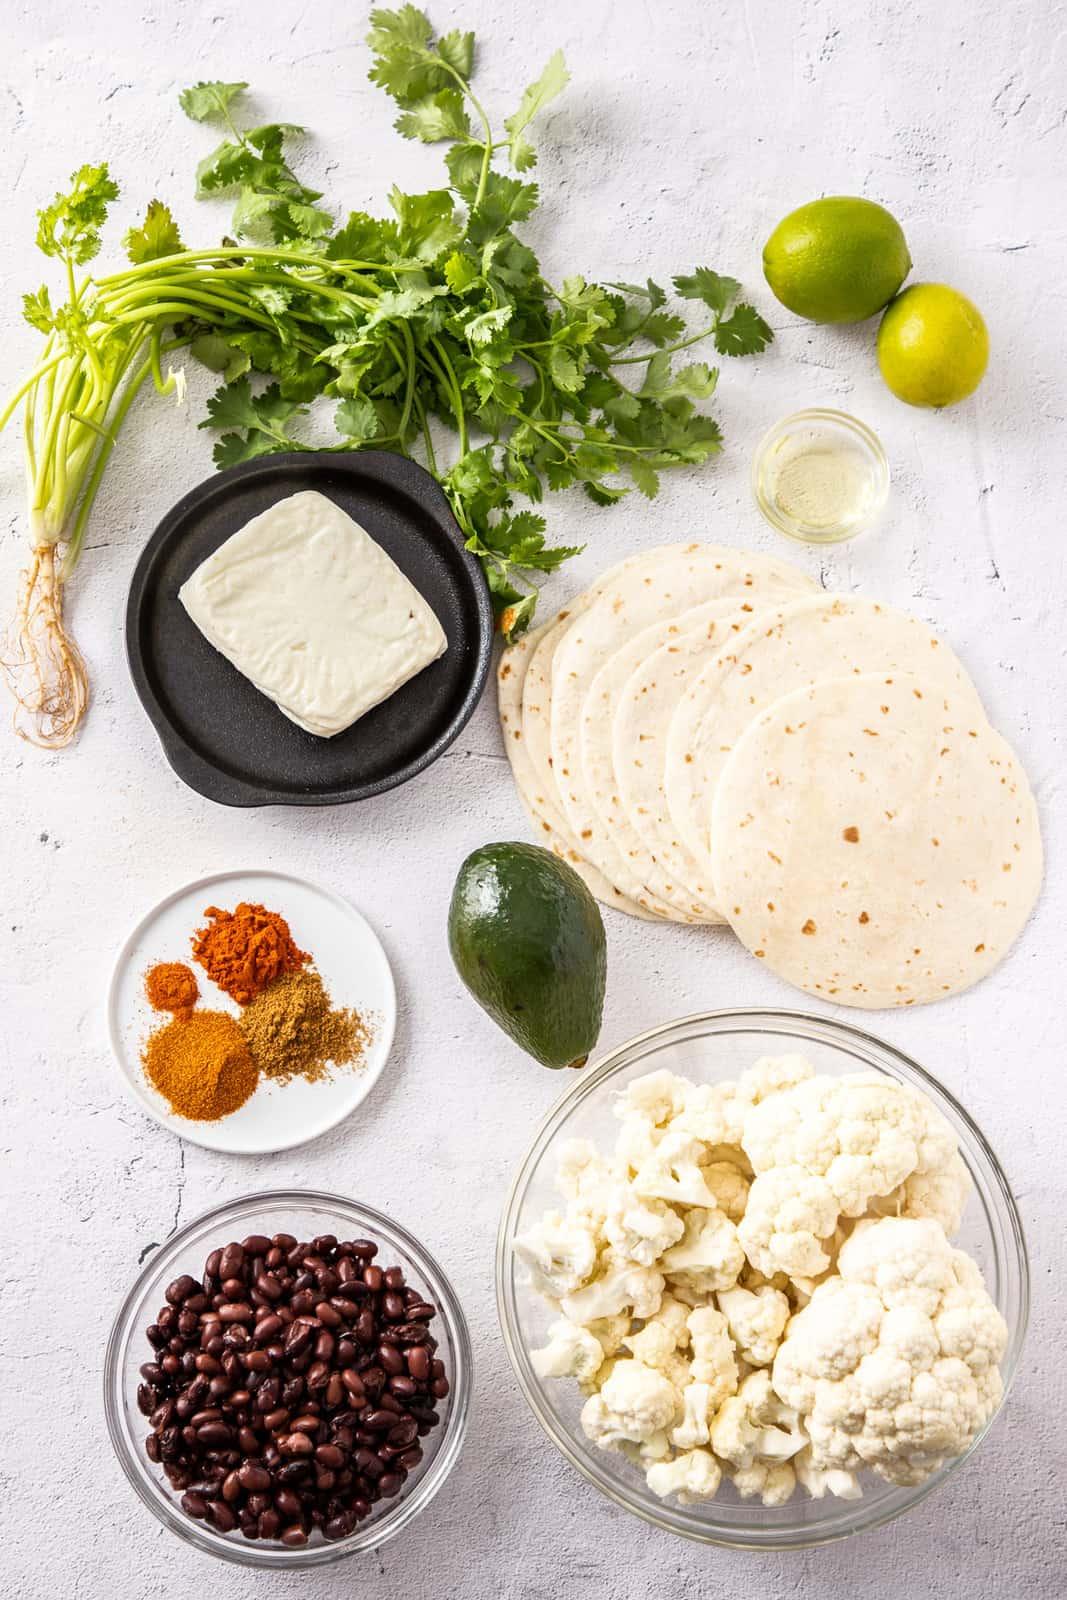 cauliflower, halloumi, black beans, spices, cilantro, lime, avocado, and soft taco shells on a white background